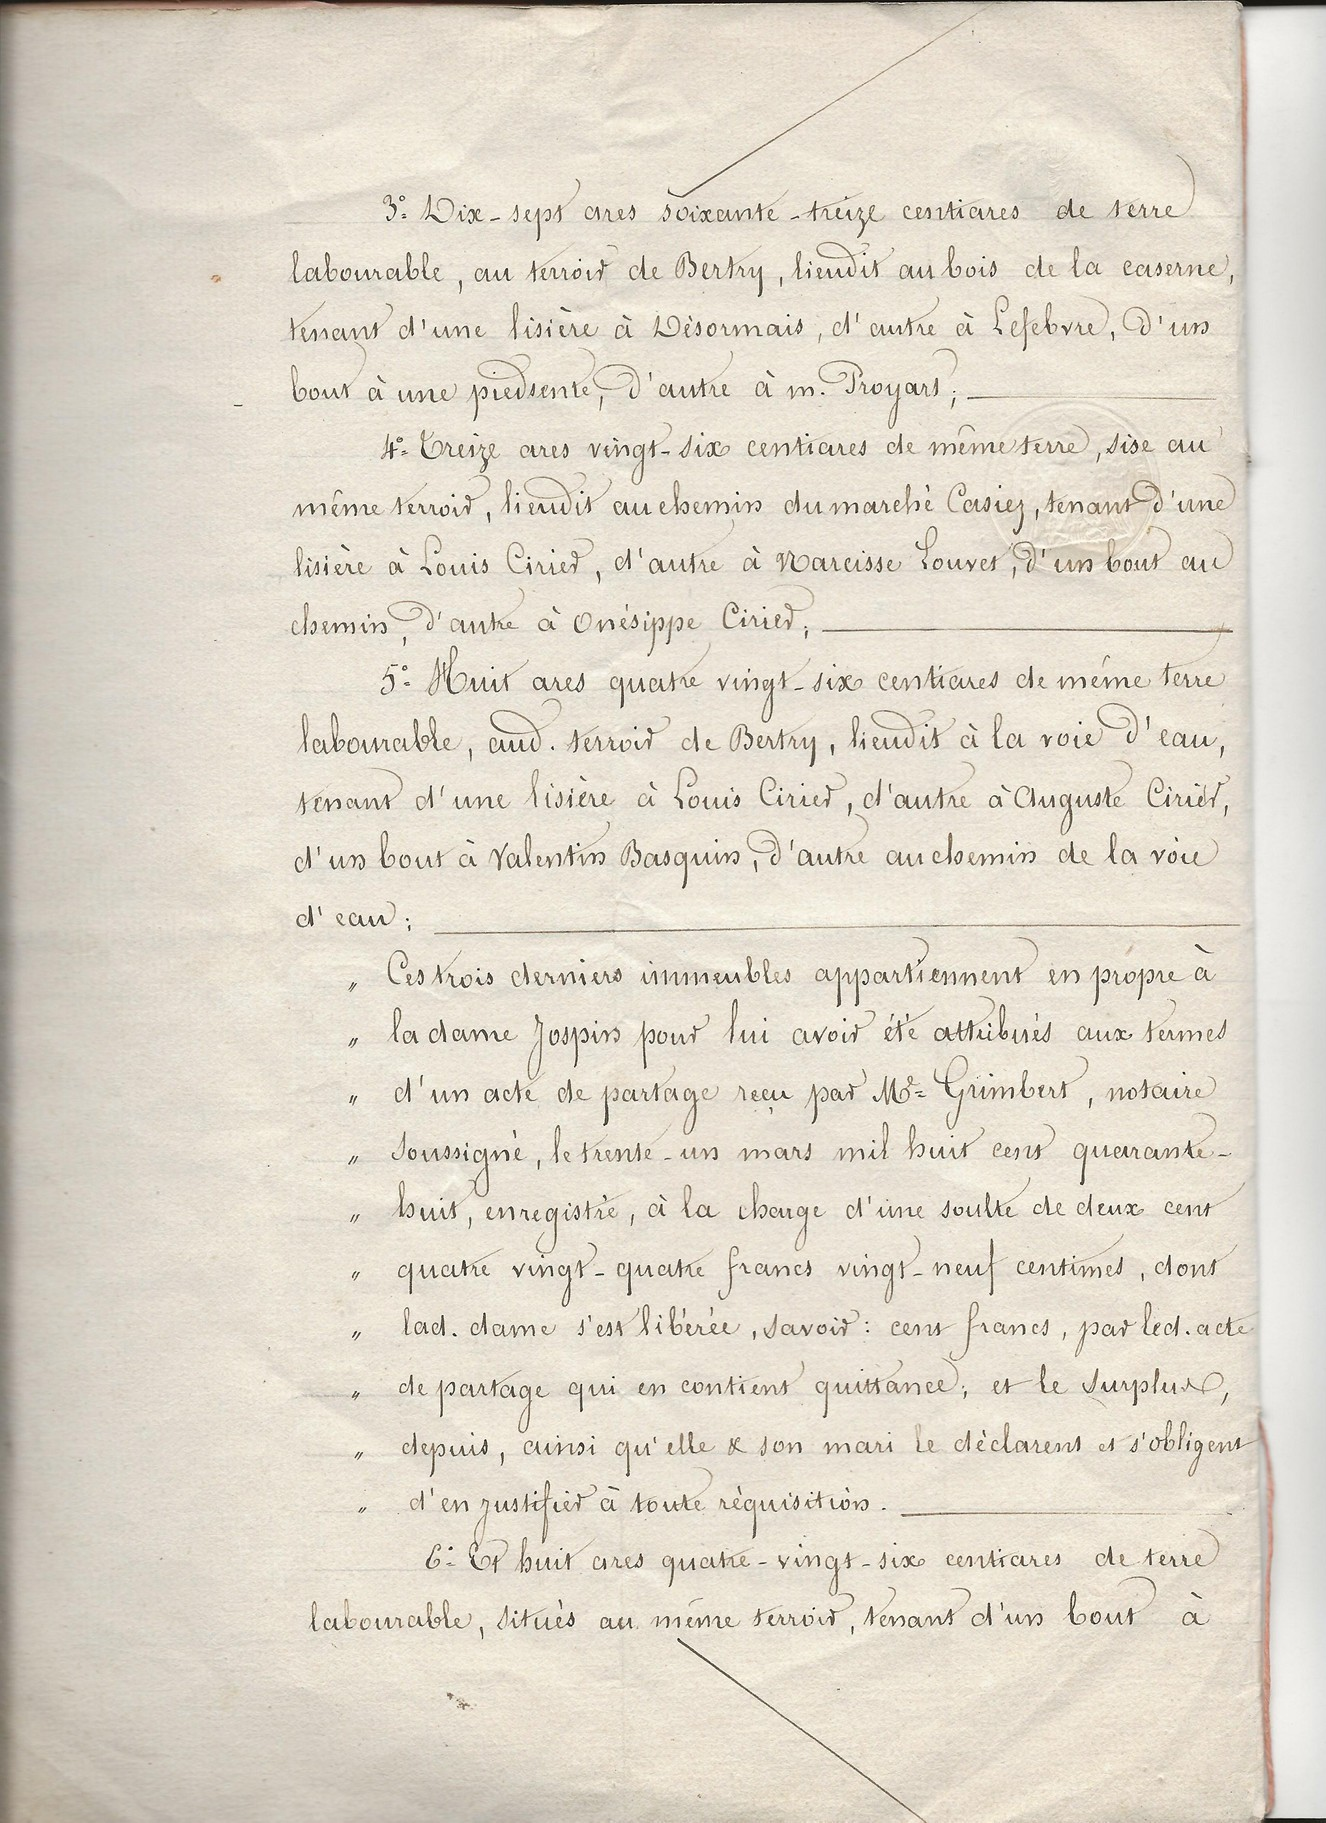 1854 emprunt hypothecaire jospin a leger plusquin 004